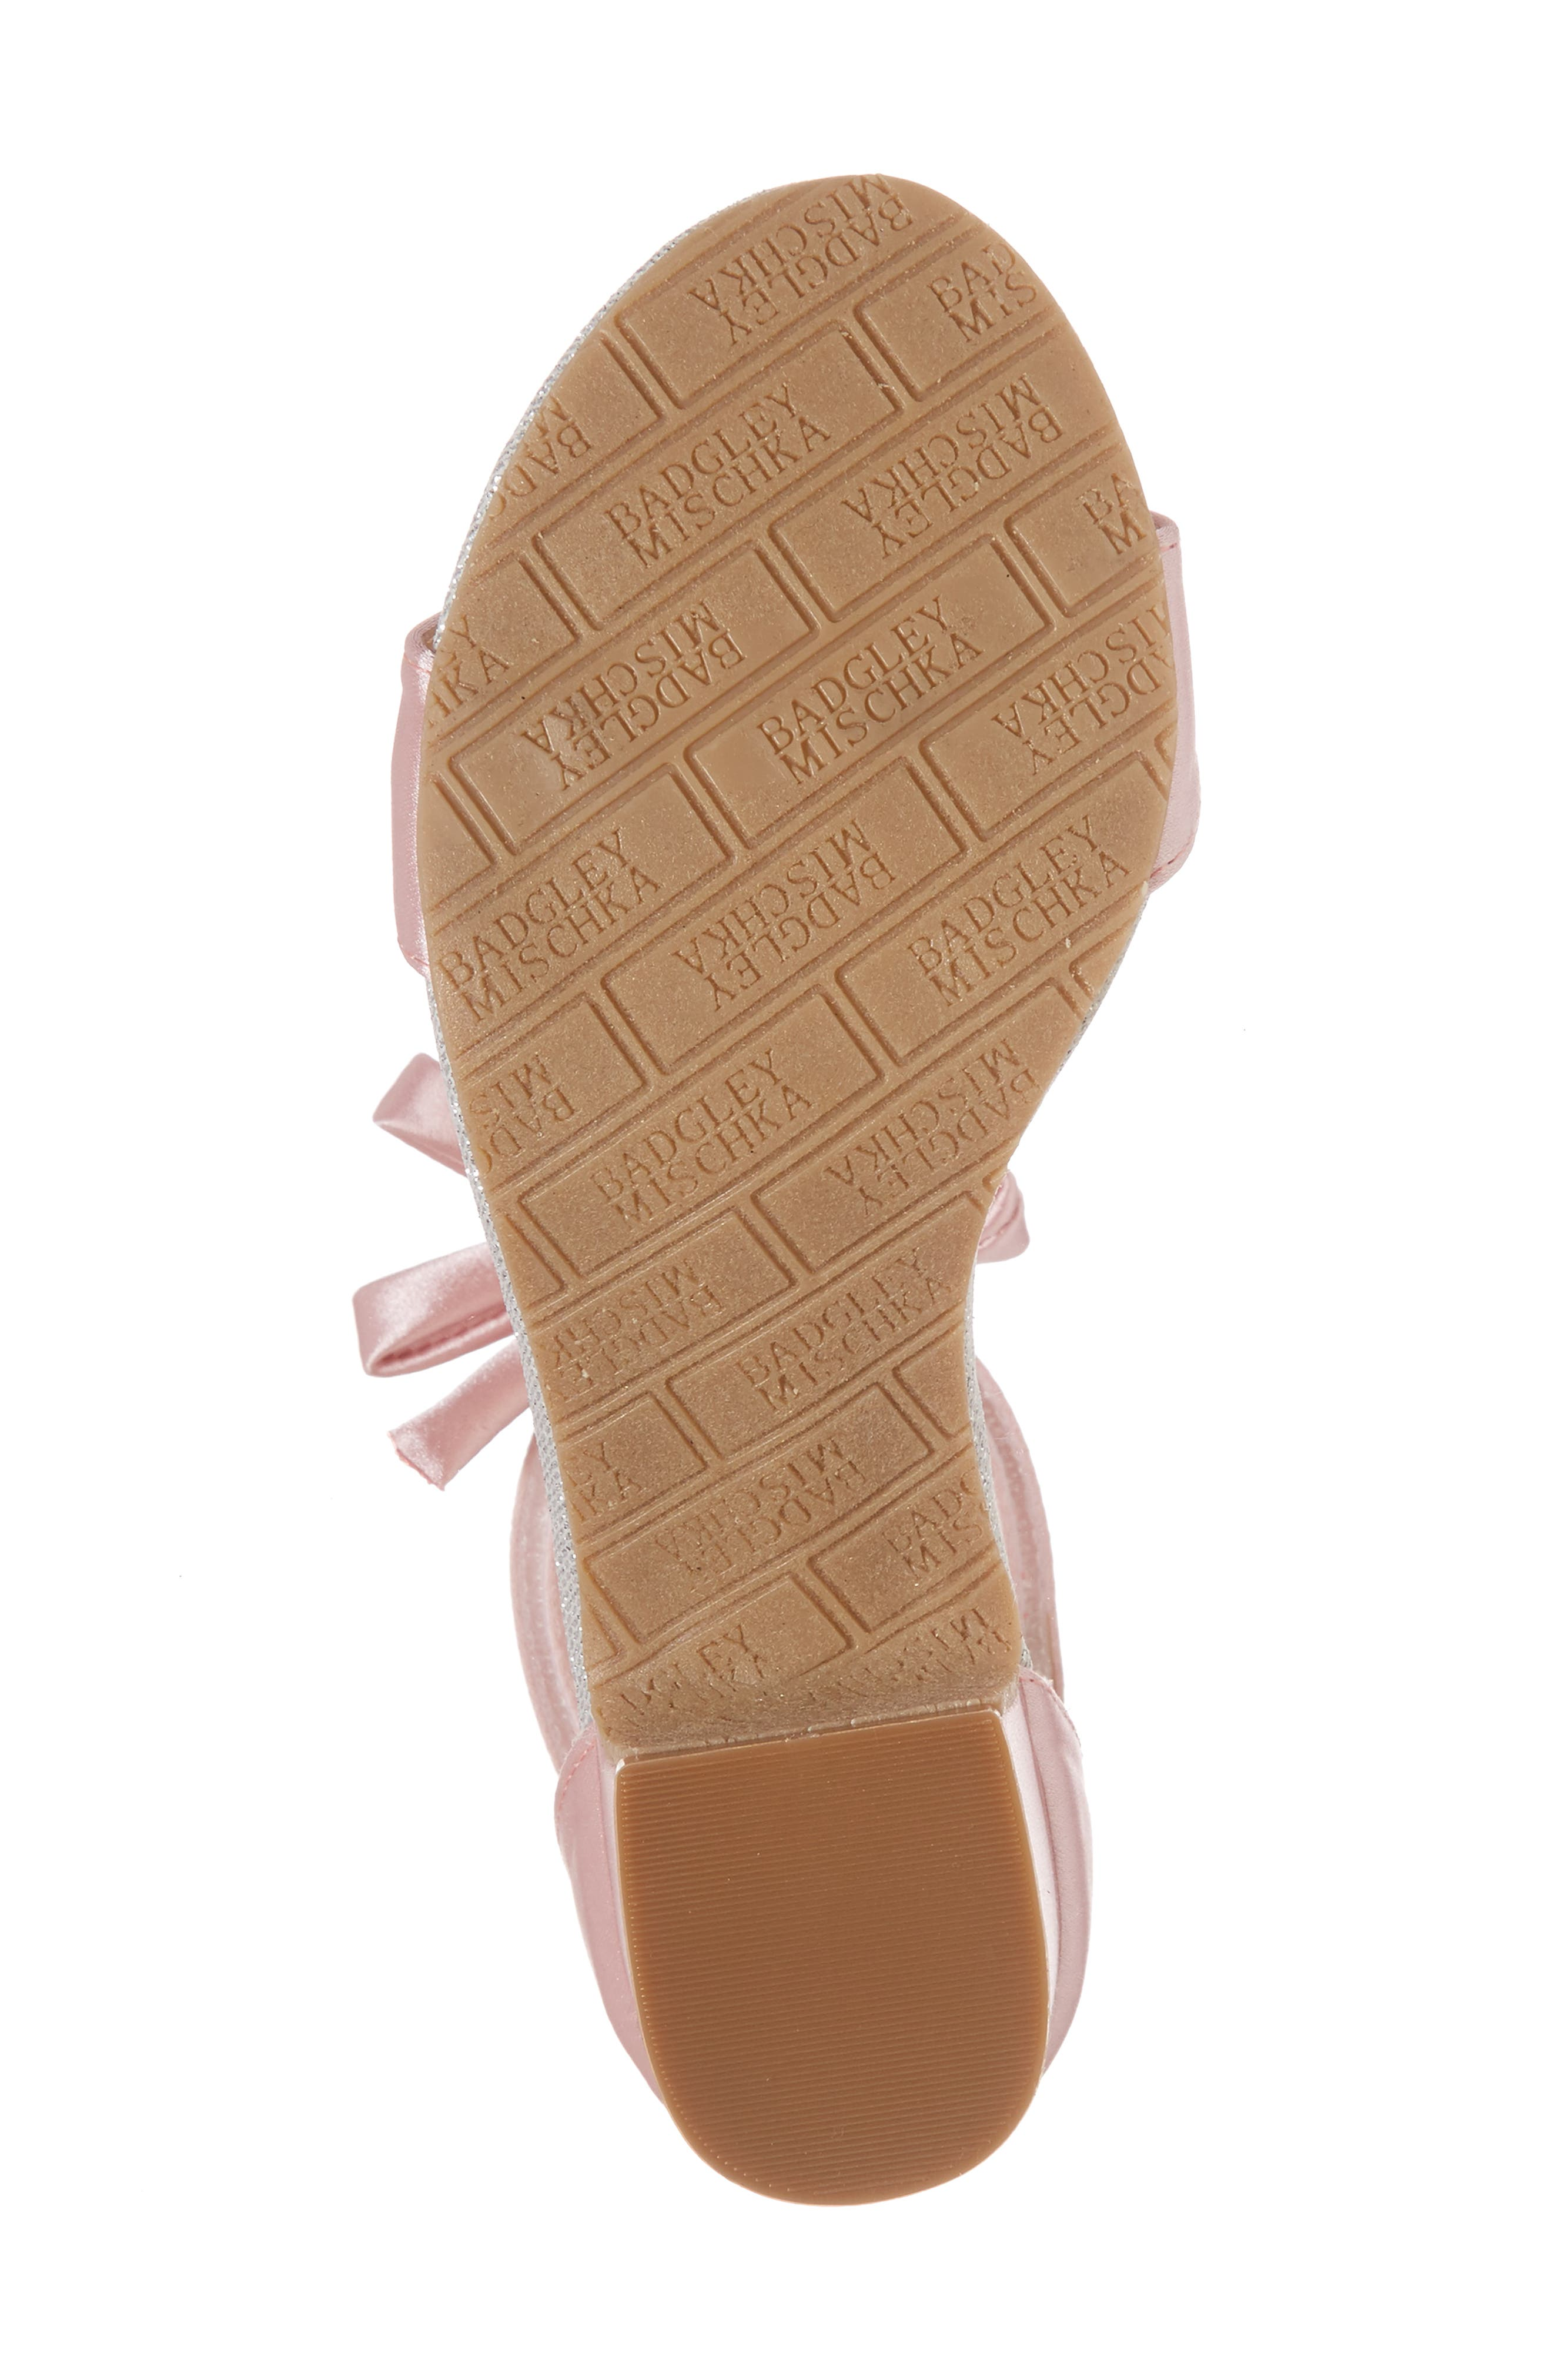 Pernia Embellished Sandal,                             Alternate thumbnail 6, color,                             PINK/ SILVER